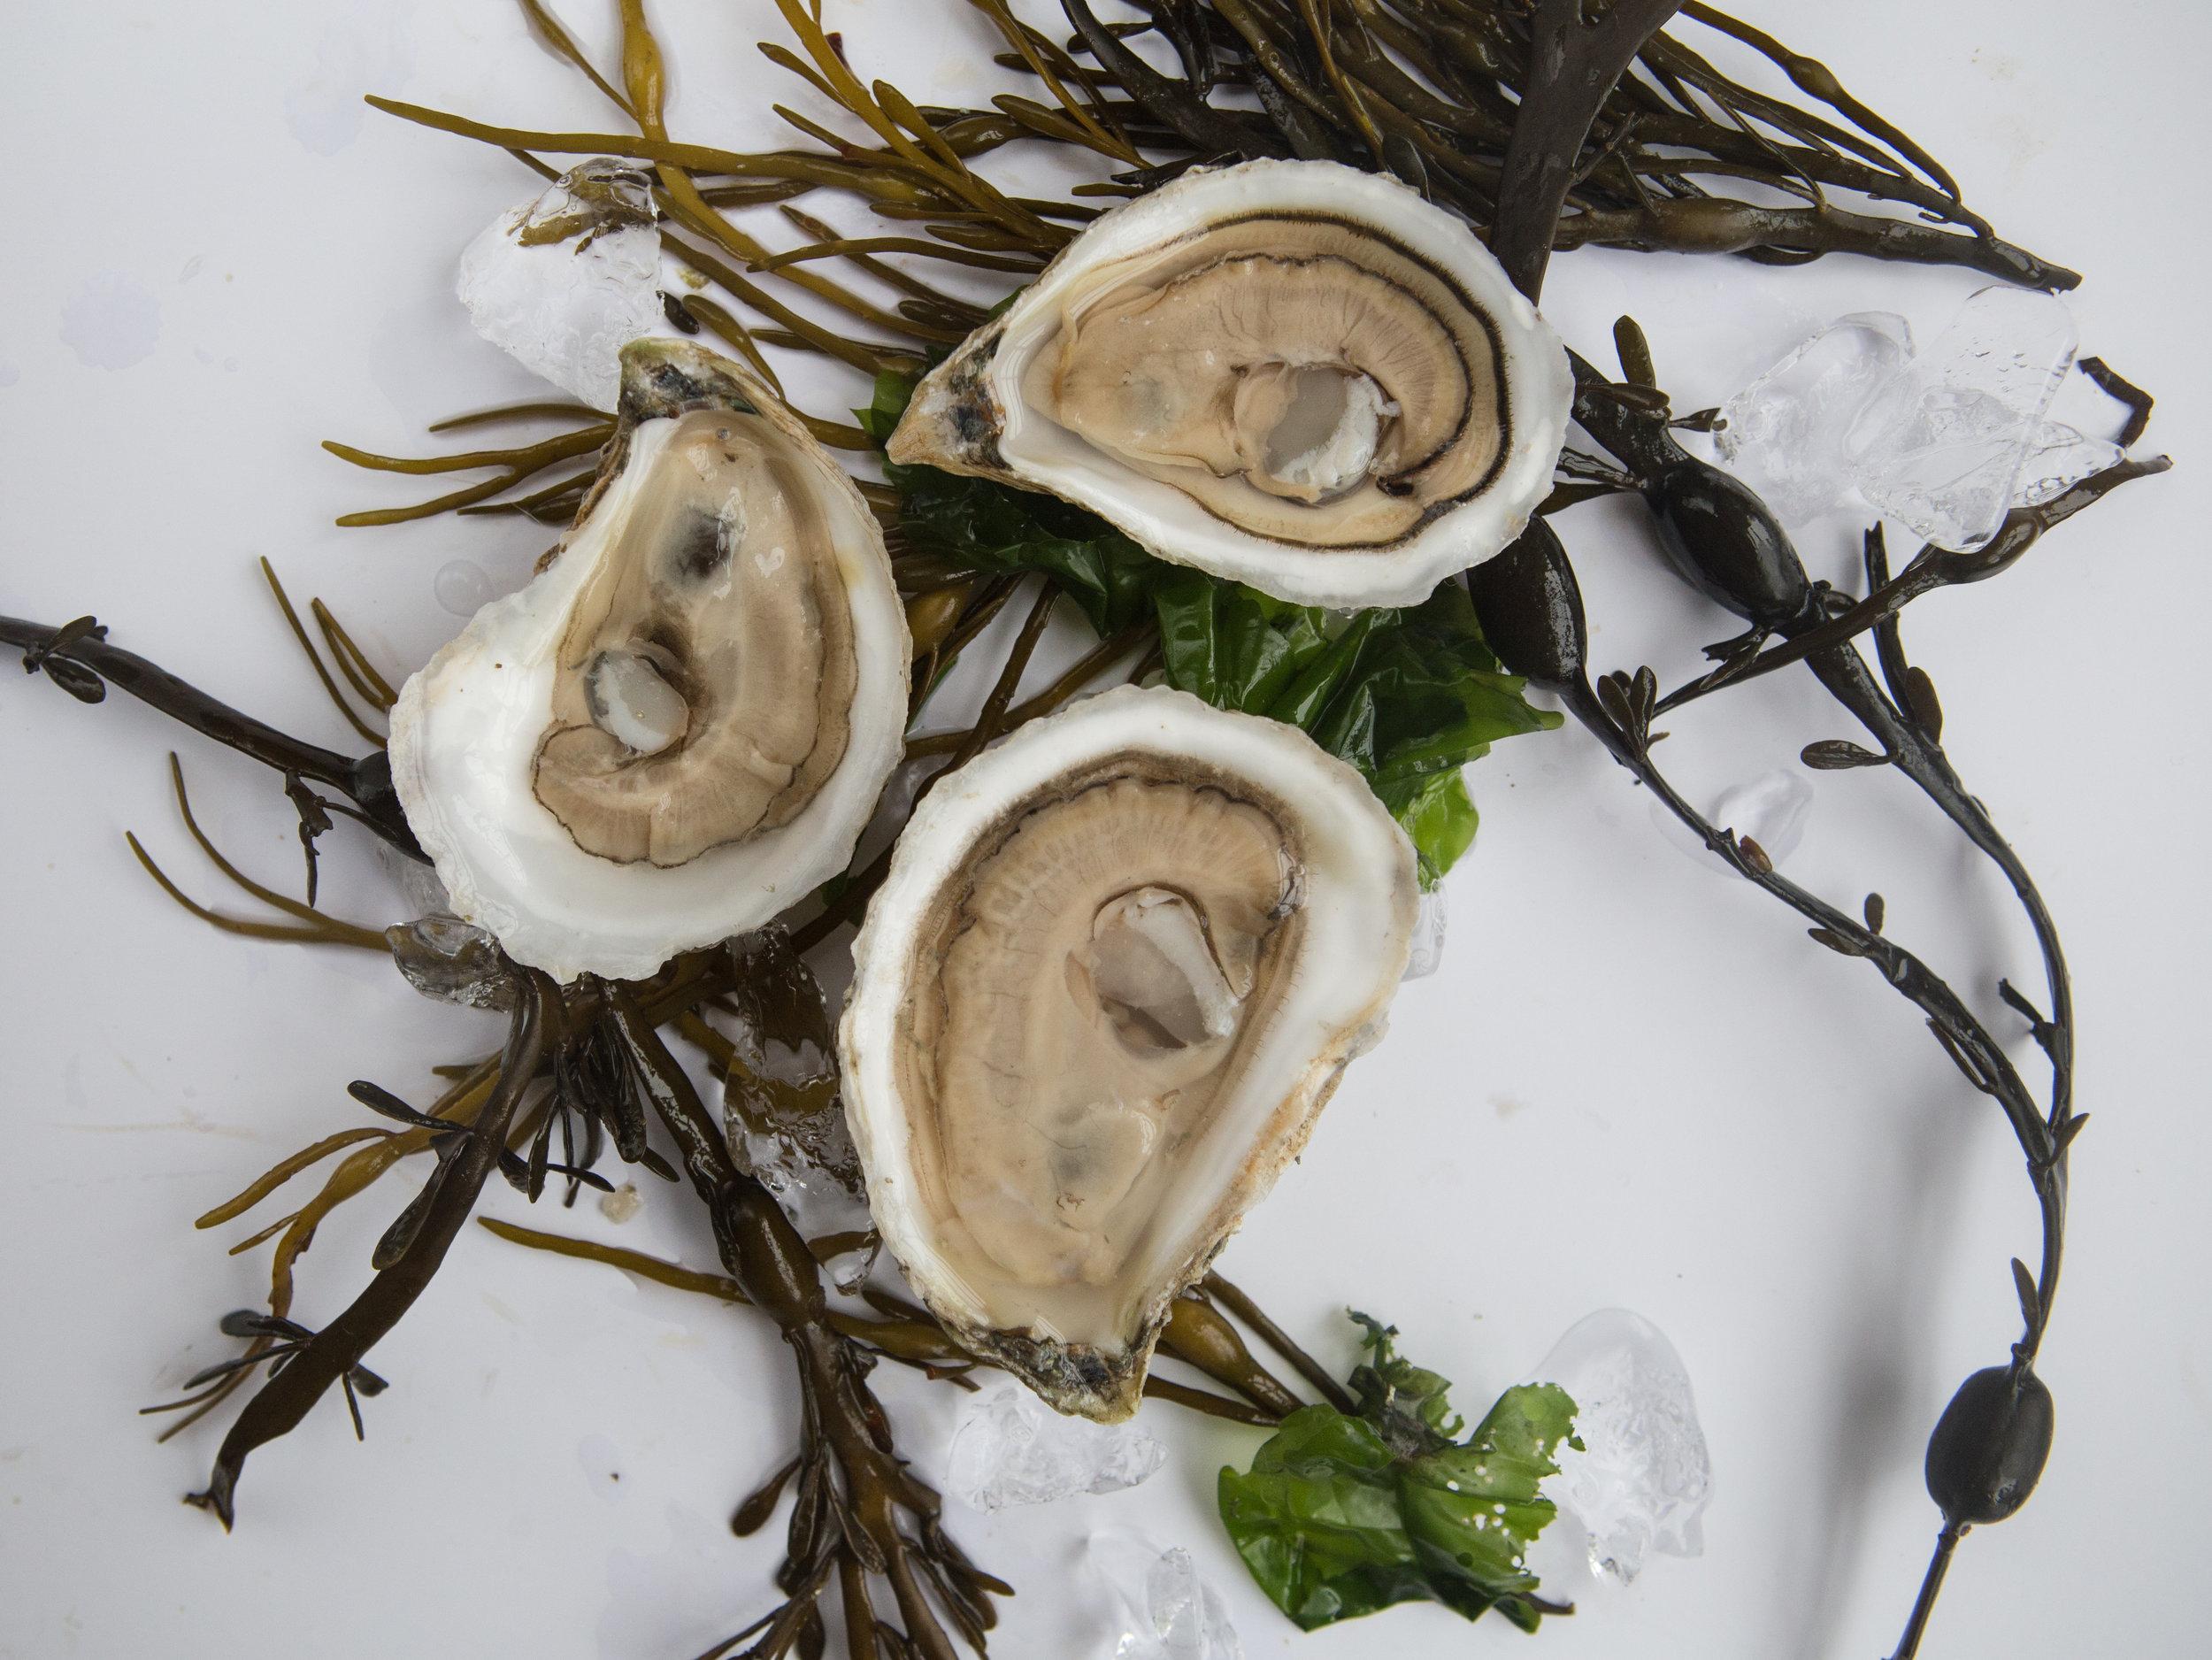 gpo oysters schucked on seaweed.jpg